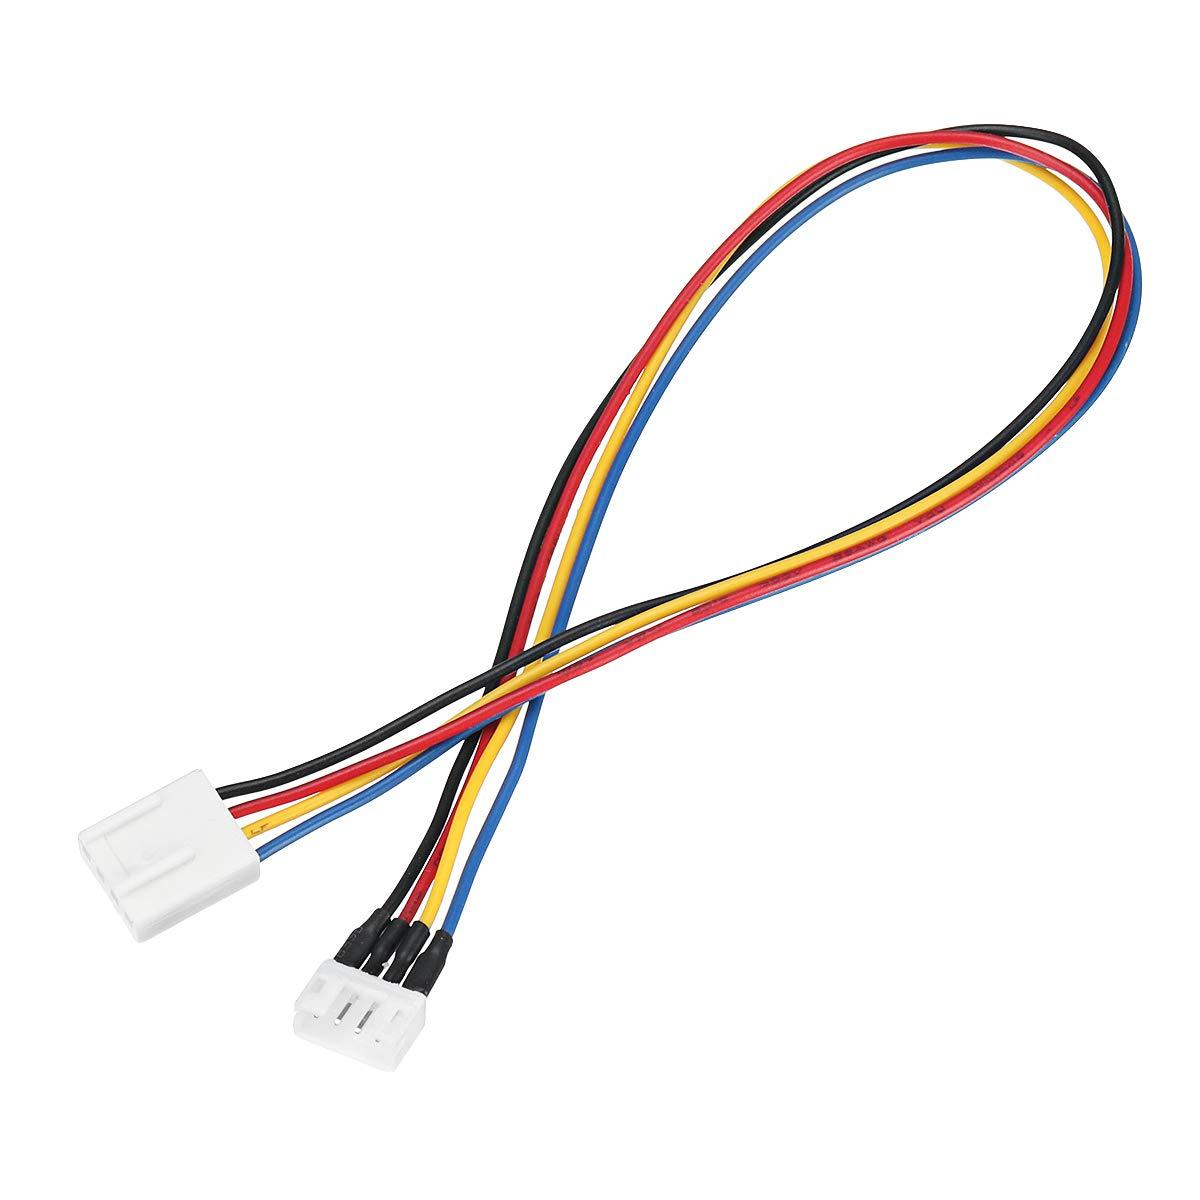 PANGUN 12Cm Pc 4-Pin Pwm Refrigeración Ventilador Conector Hembra ...